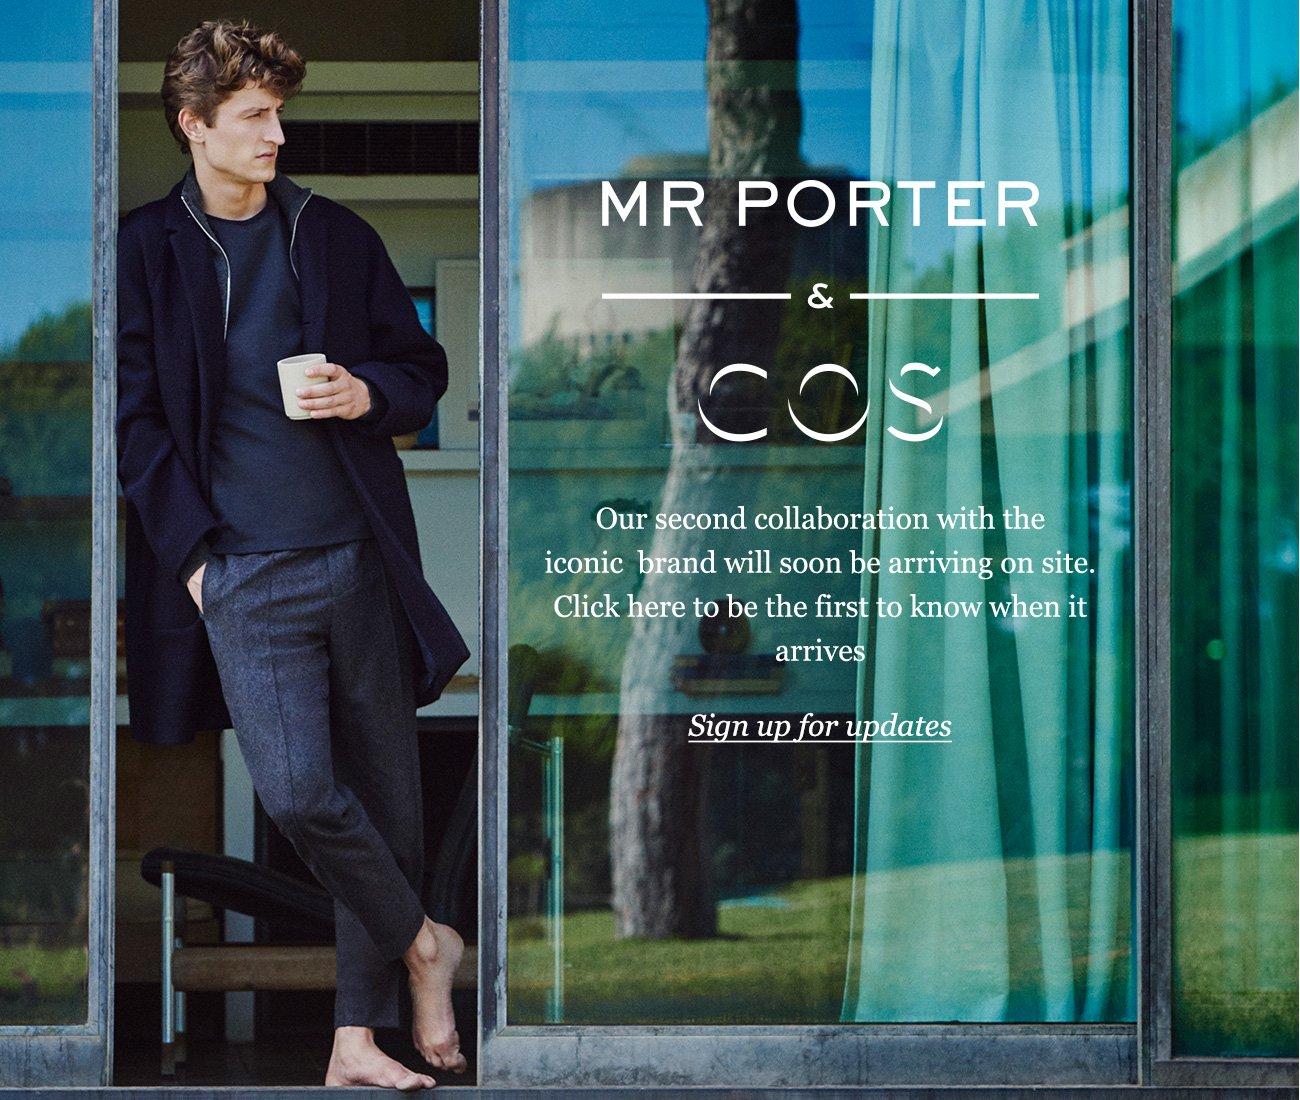 Mr porter mr porter and cos present the art of the for Mister porter